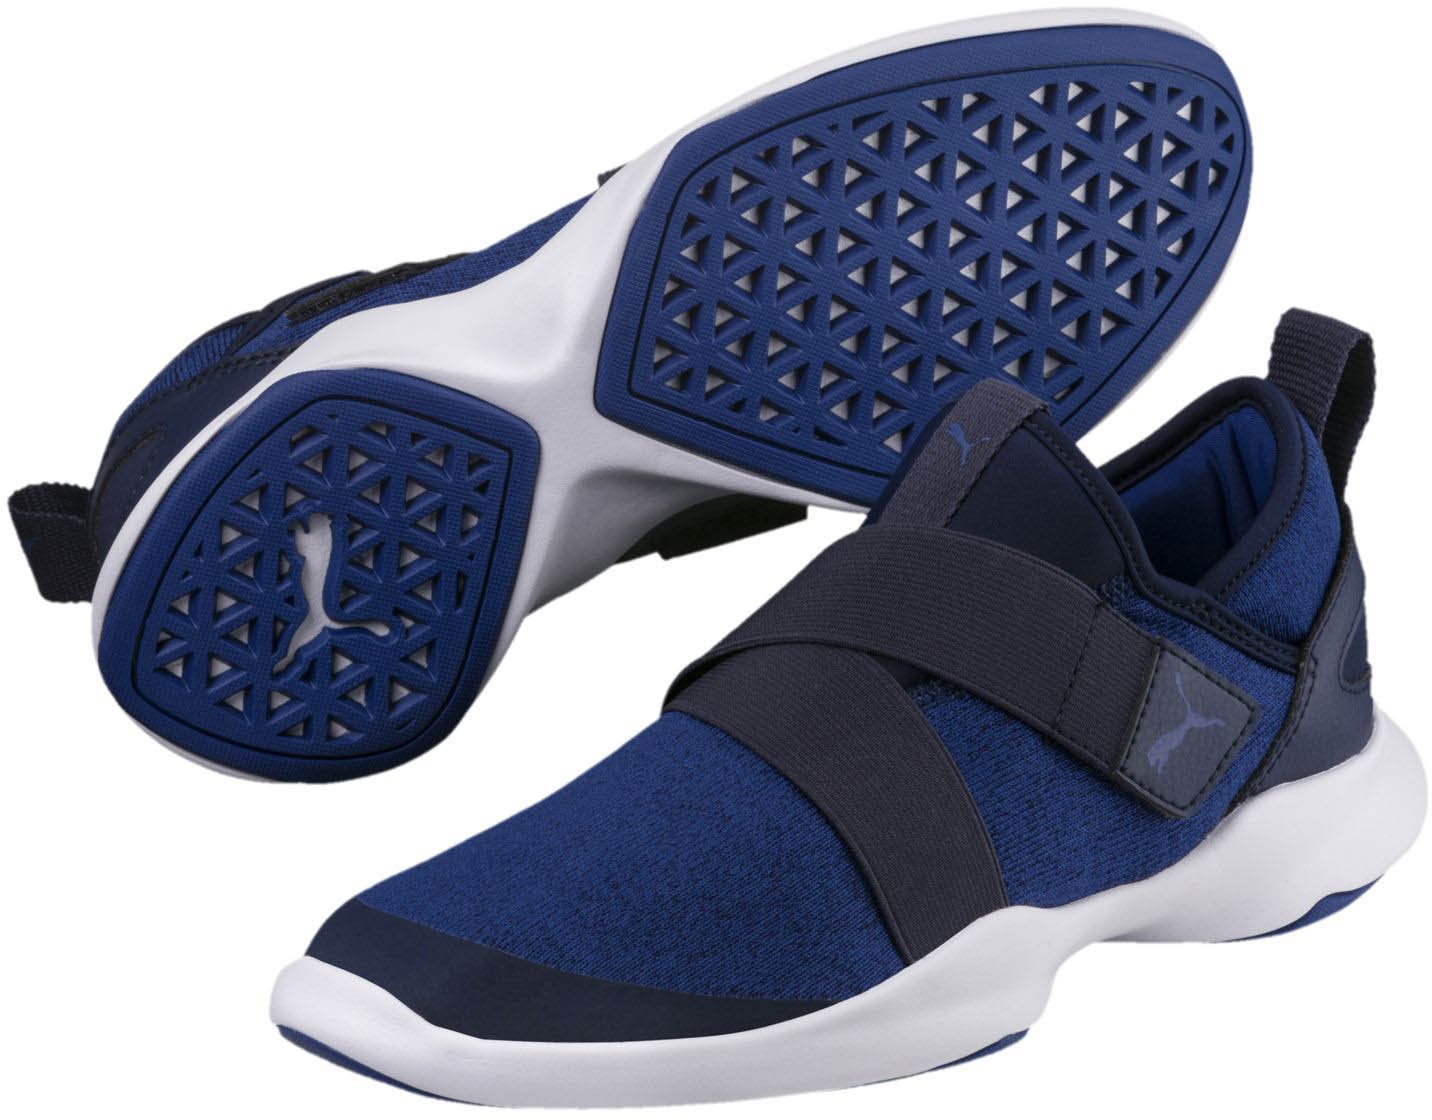 PUMA Women's Dare Ac Sneaker B077SS2K78 6.5 M US|Peacoat-sodalite Blue